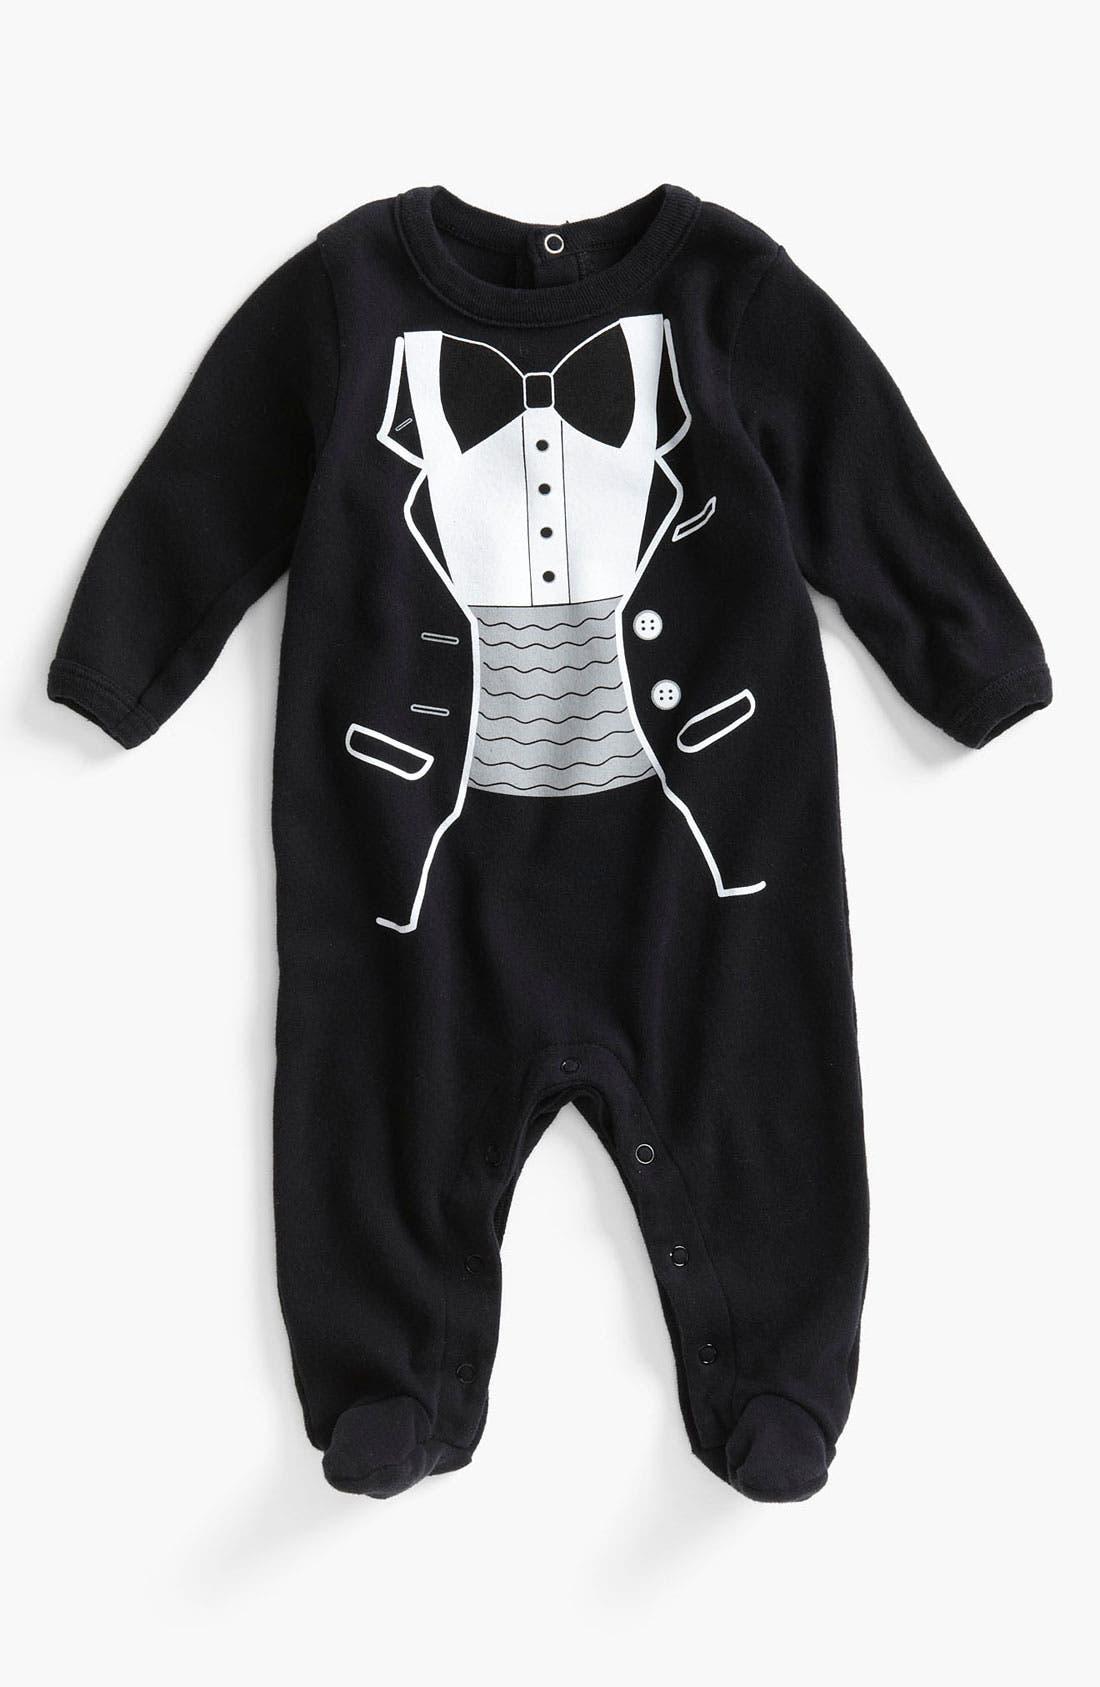 Main Image - Sara Kety Baby & Kids 'Tuxedo' Footie (Infant)